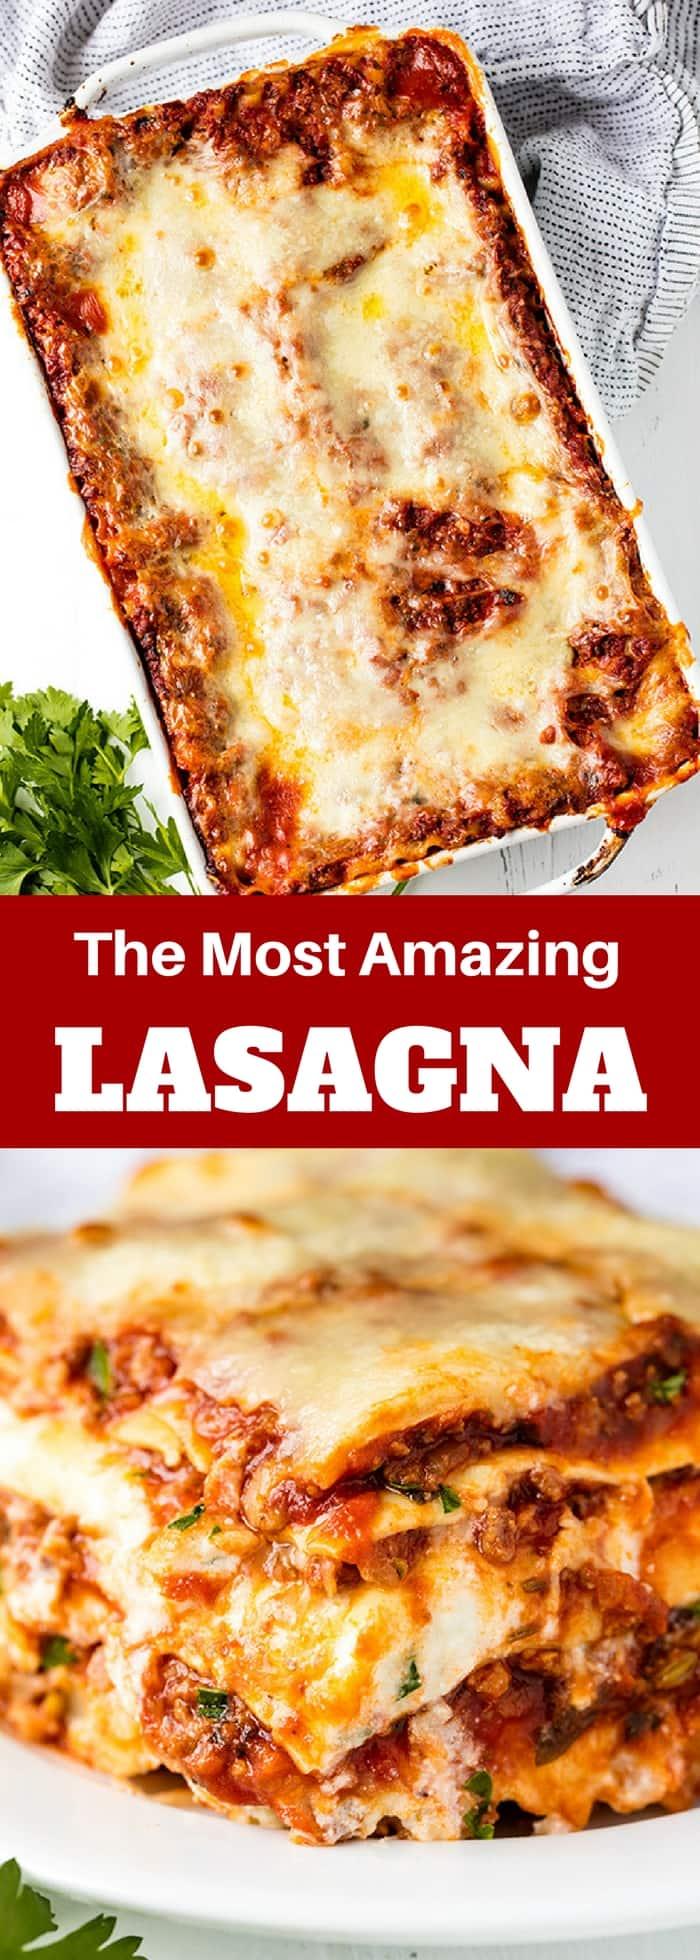 Admirable The Most Amazing Lasagna Recipe Download Free Architecture Designs Embacsunscenecom